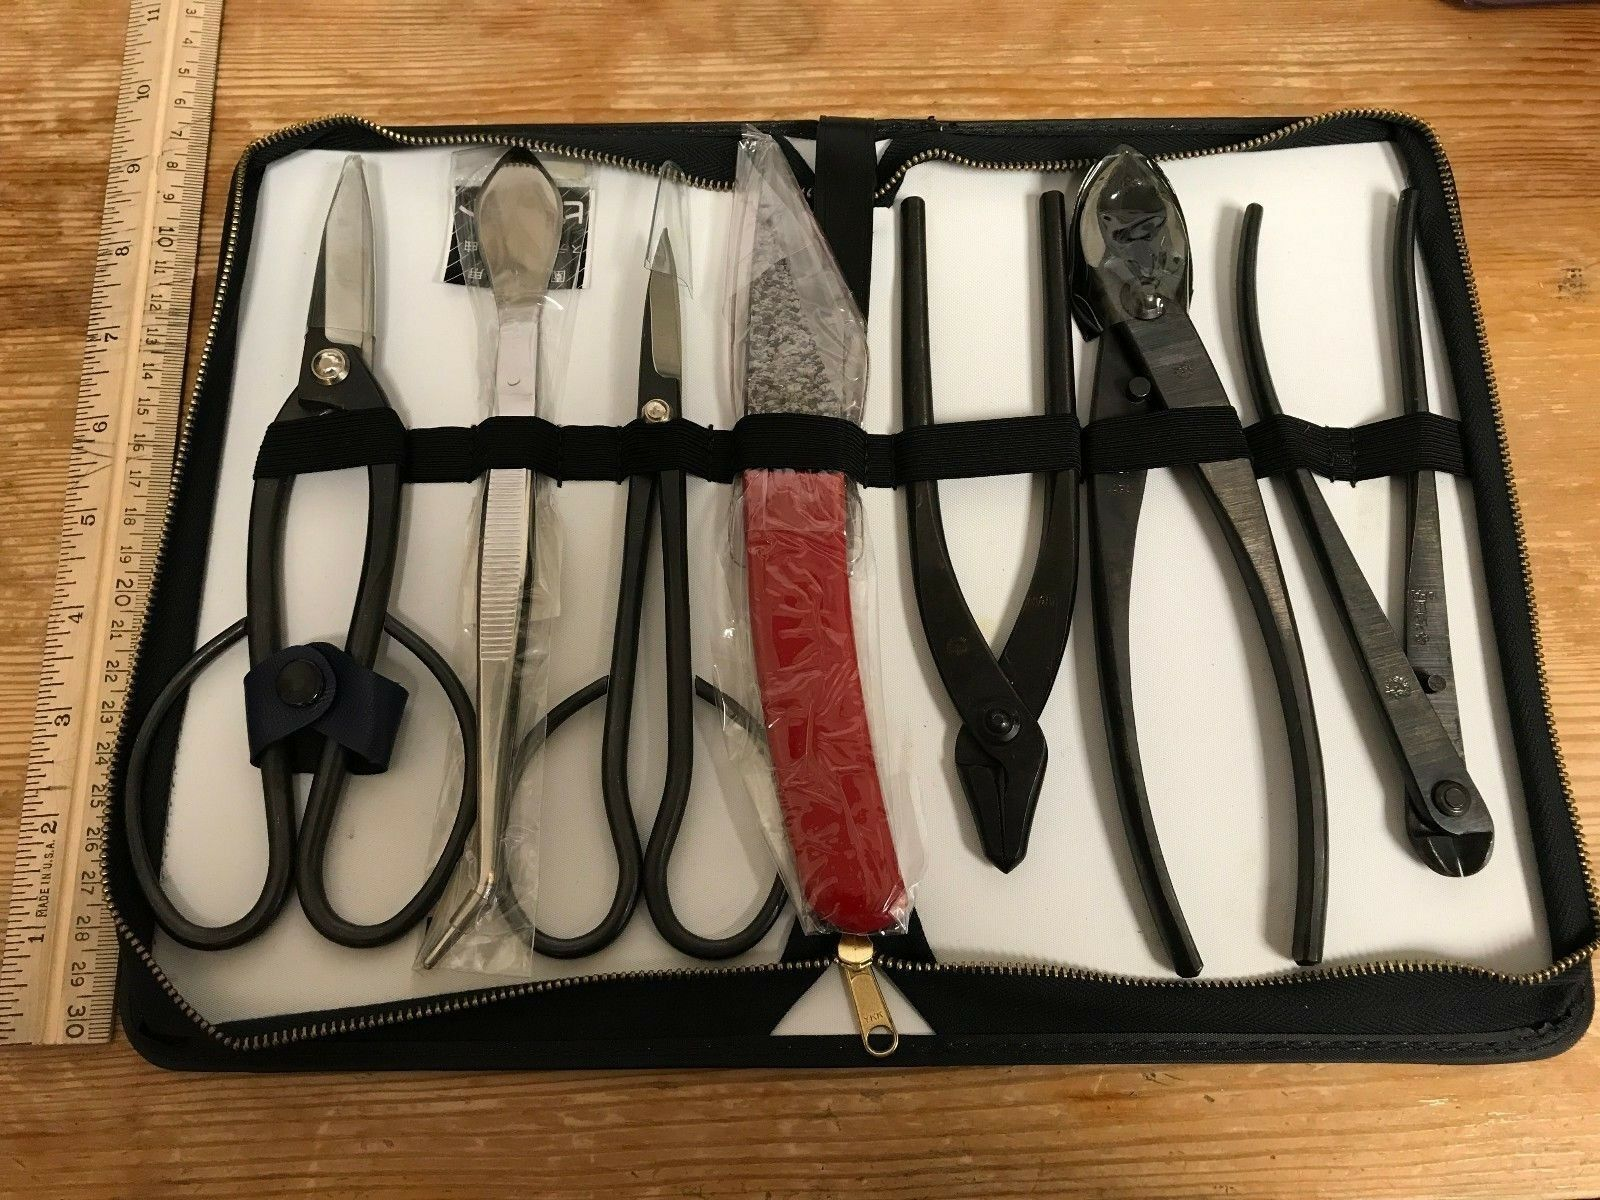 Bonsai Tool Set - 8 Piece set - From Japan - Durable Carbon Steel